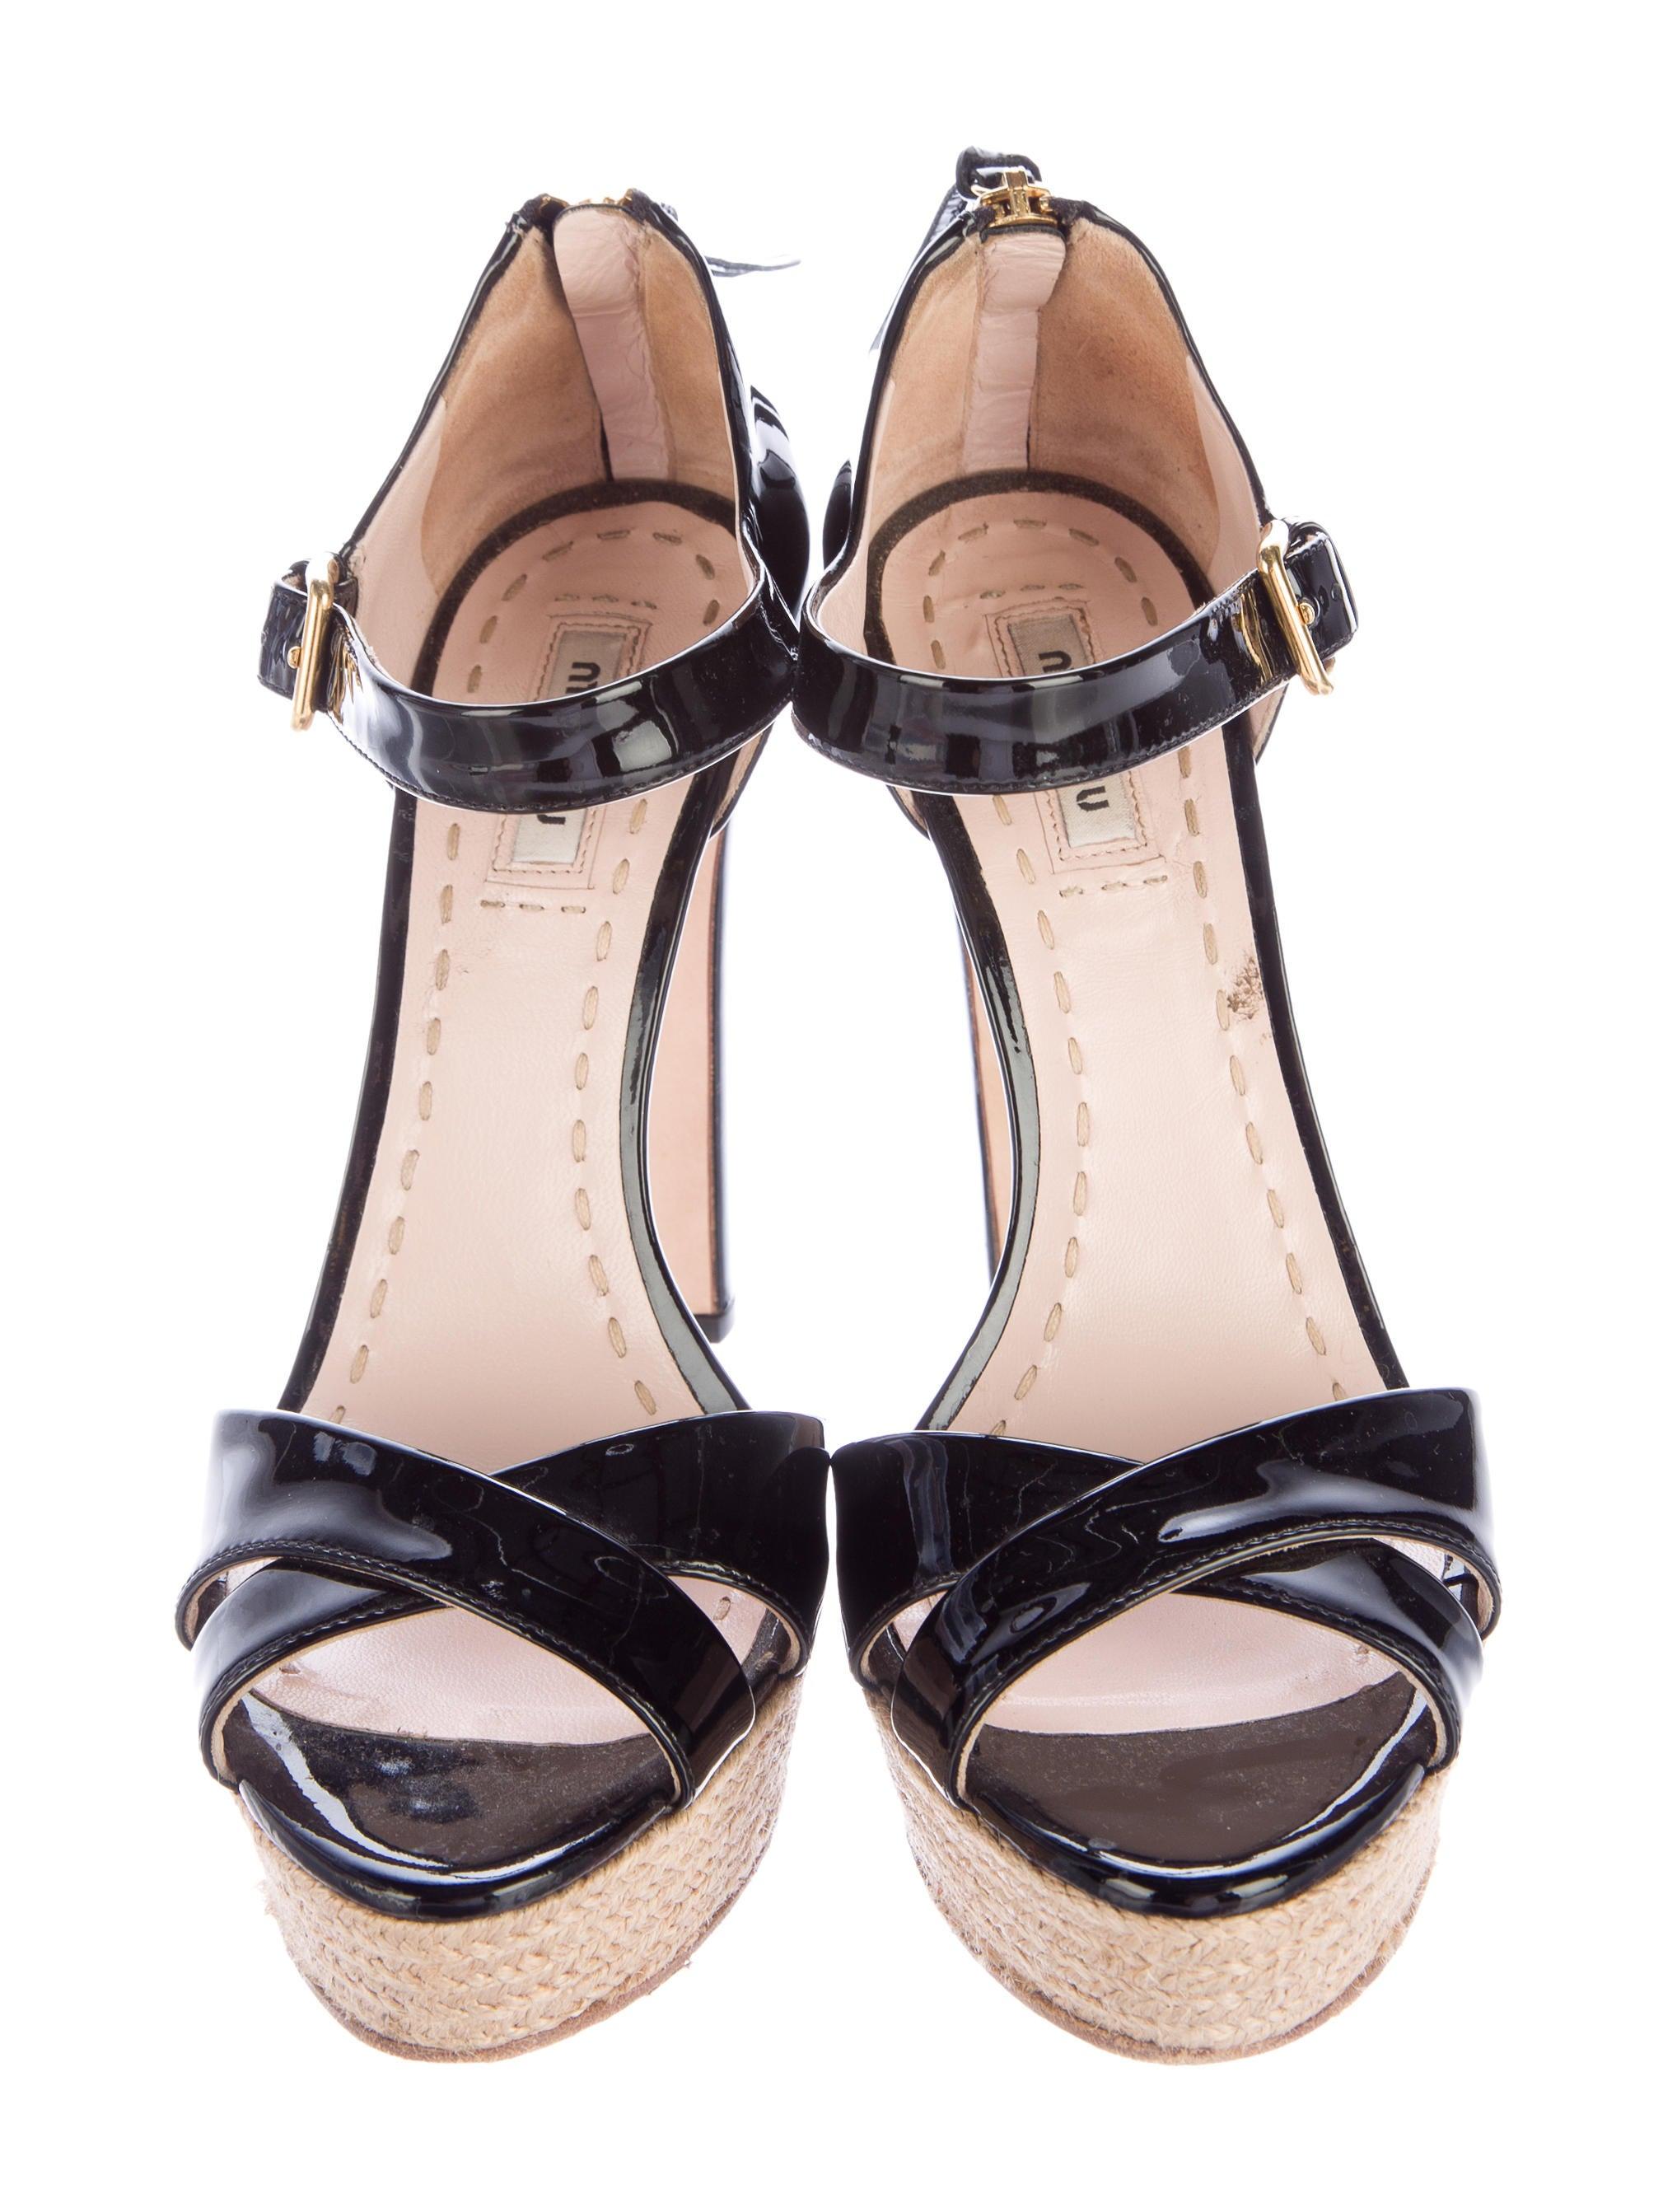 miu miu patent leather platform sandals shoes miu47059